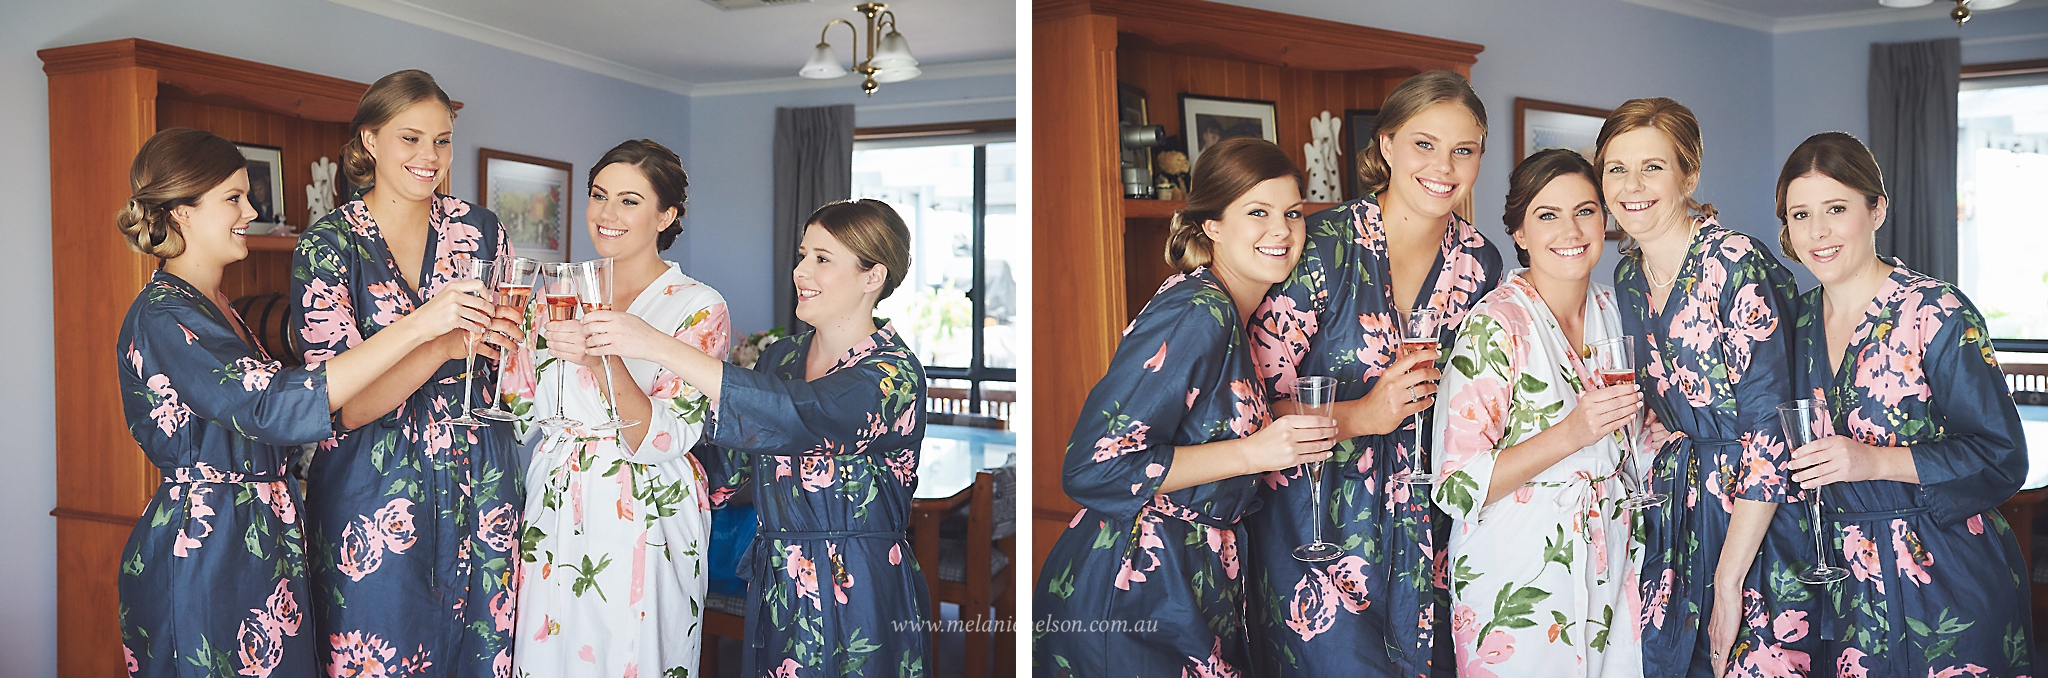 adelaide_hills_wedding_0003.jpg